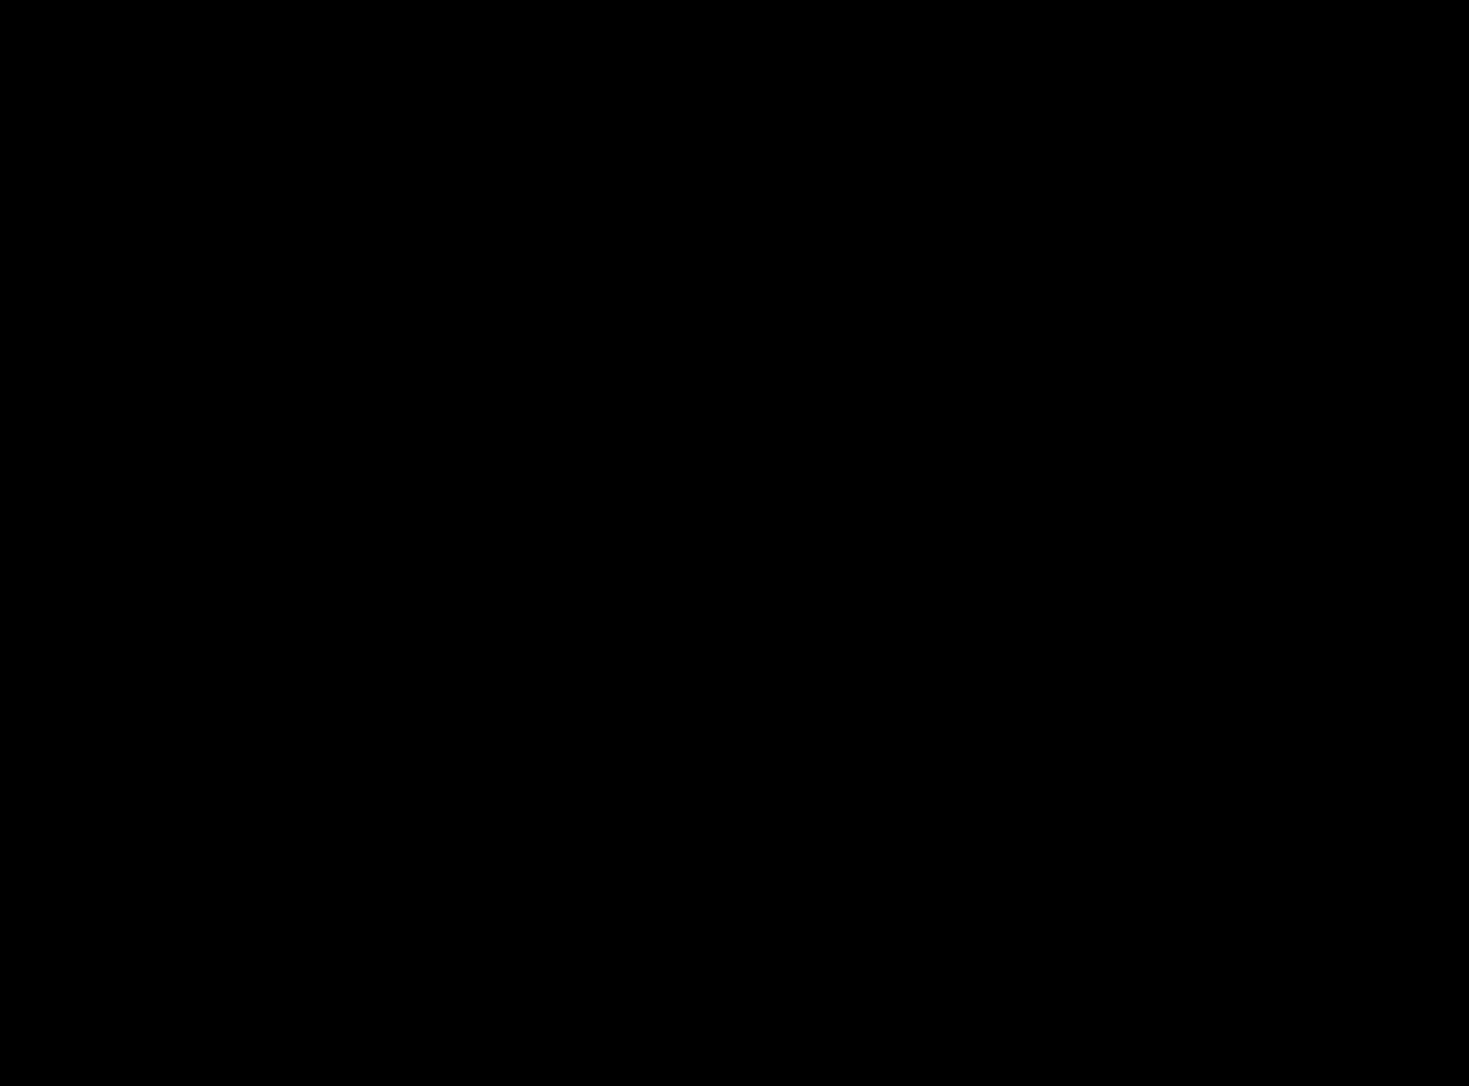 Discord PNG Image